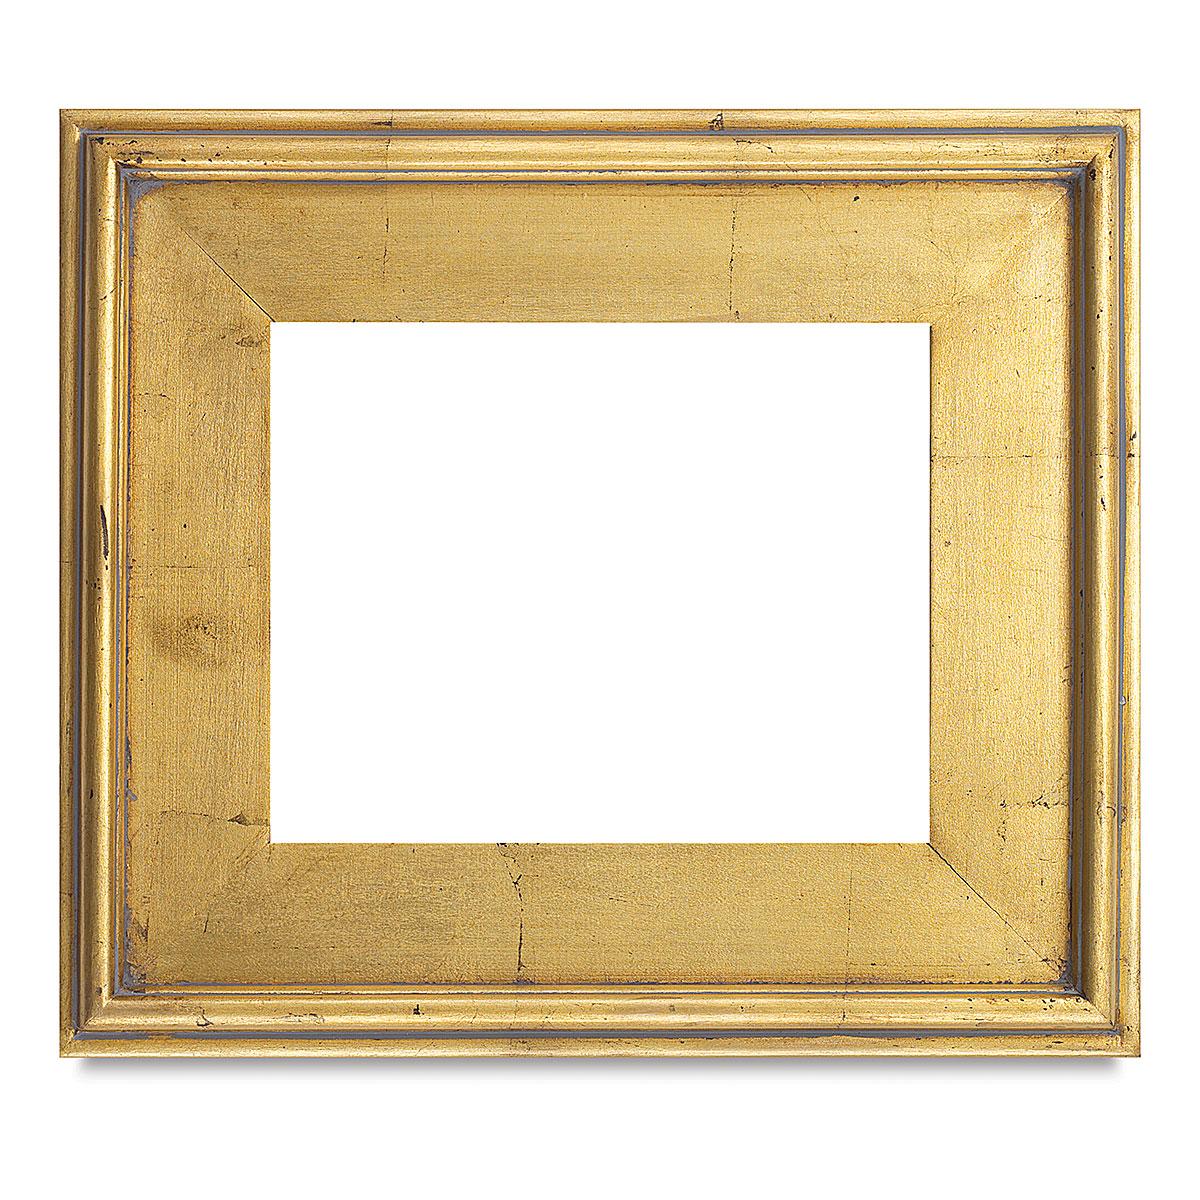 Blick Simplon Frame - 11'' x 14'' x 1/2'', Gold Leaf